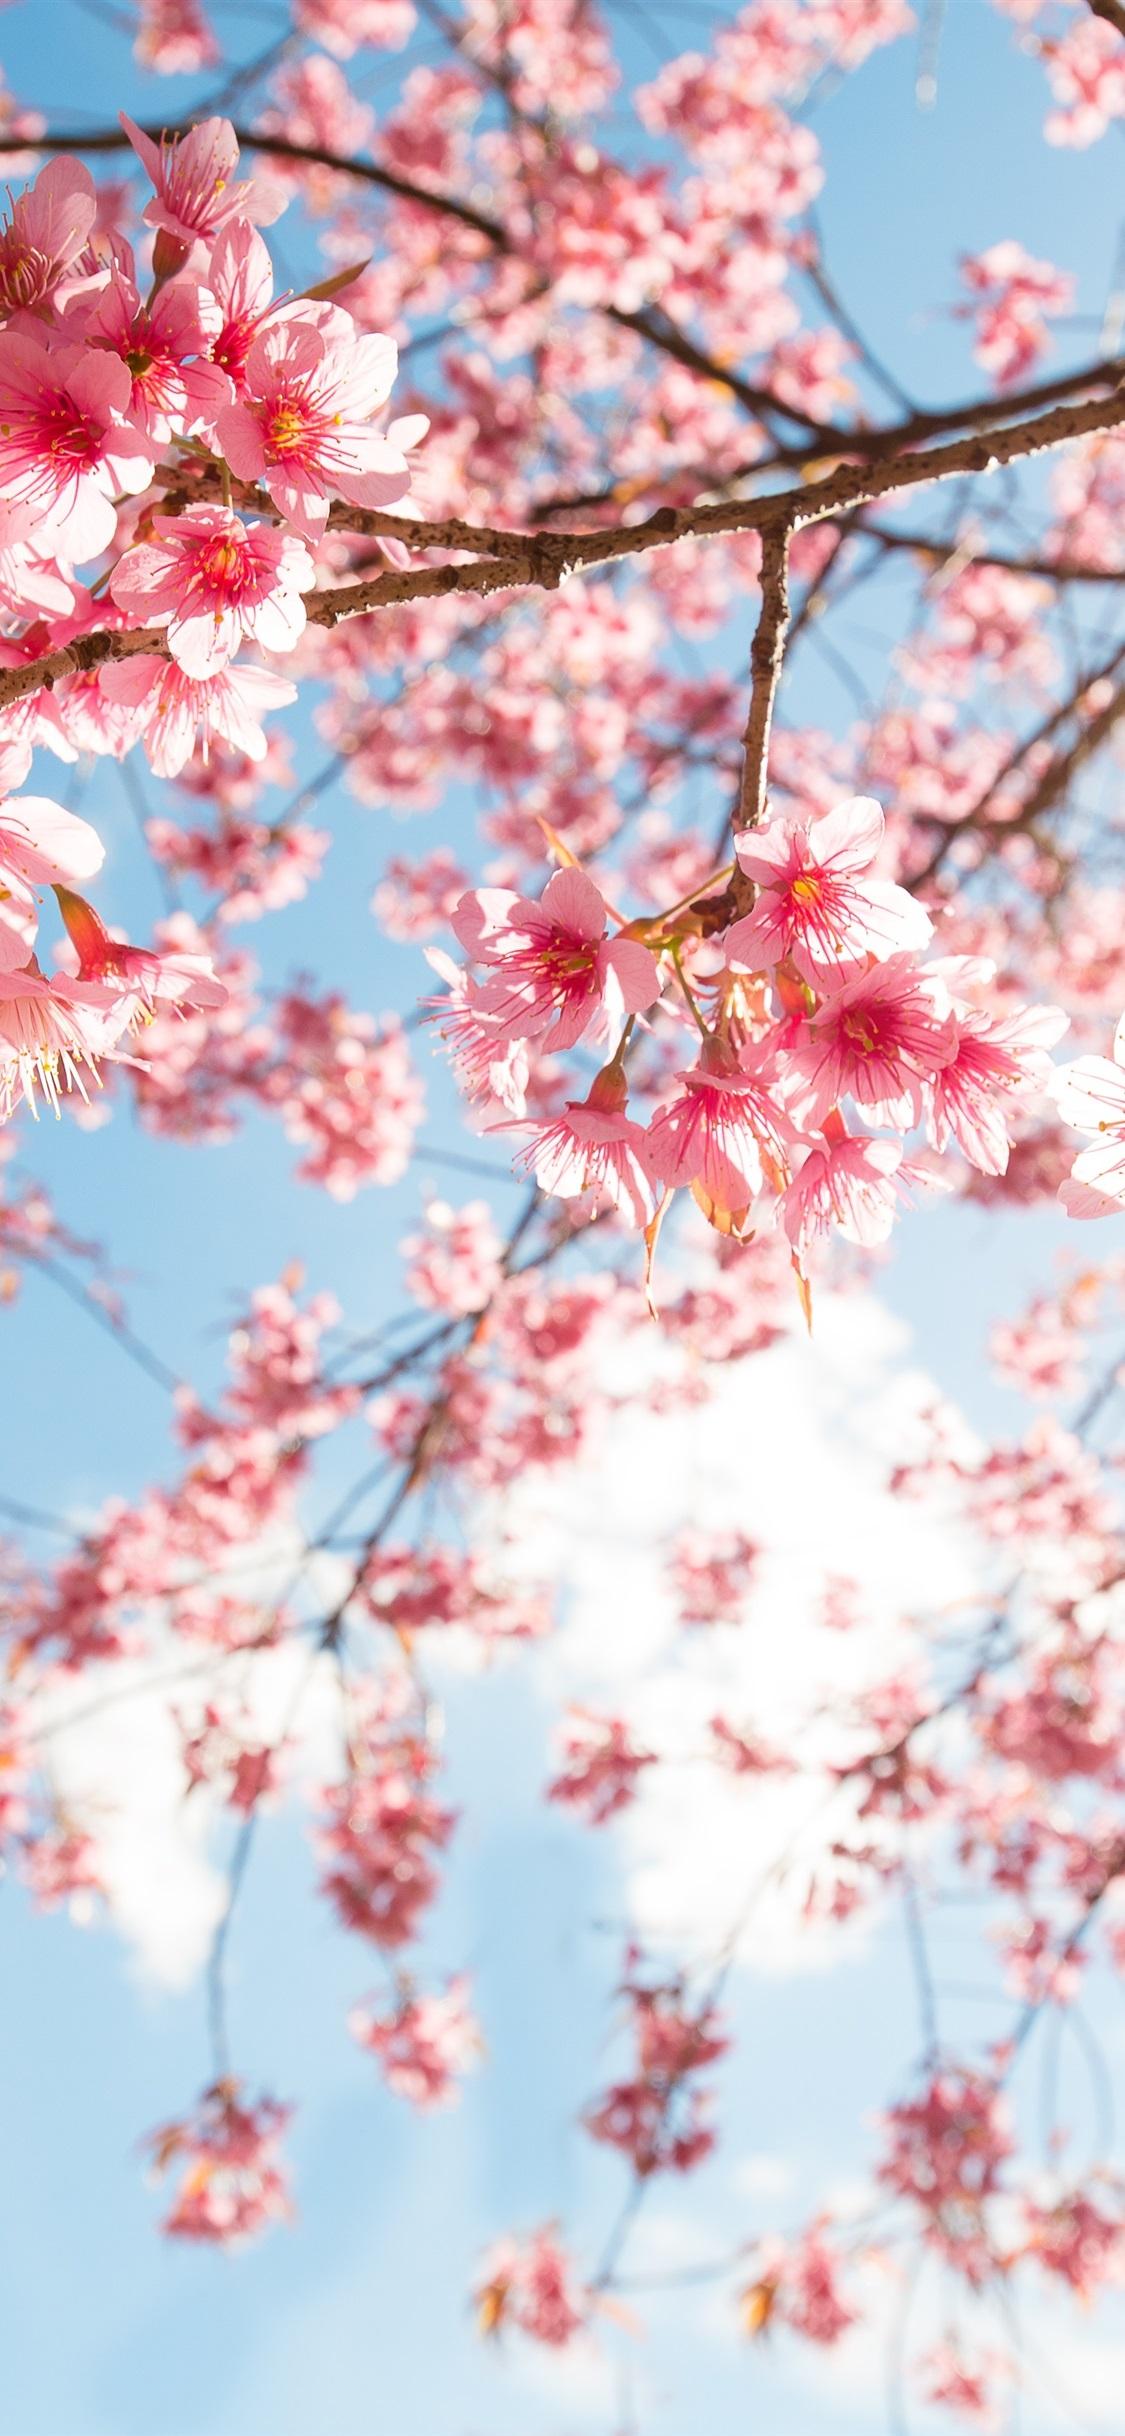 Pink Sakura Blossom Twigs Sky Sunshine 1125x2436 Iphone